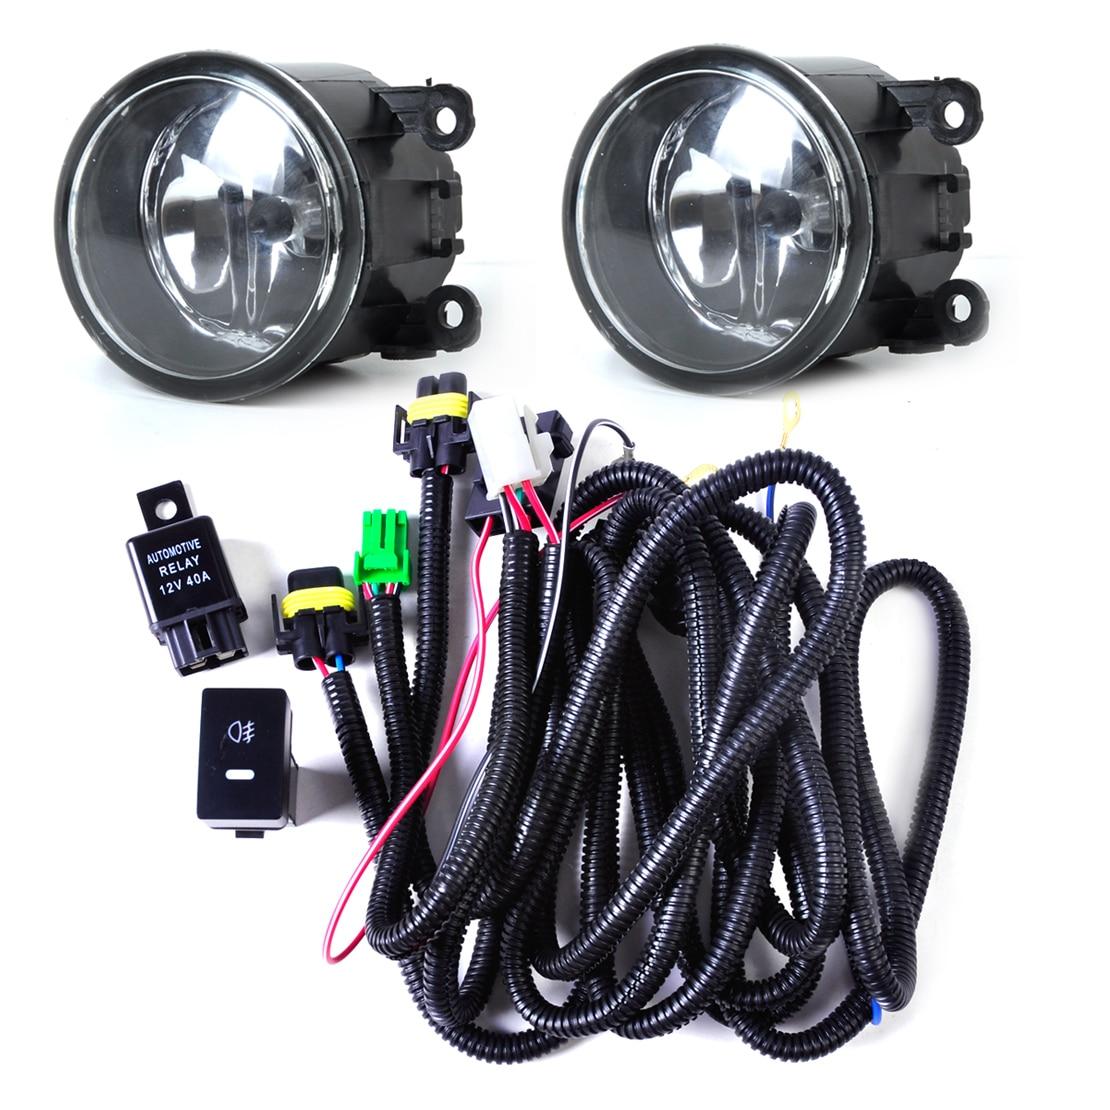 protege fog light wiring harness wiring diagram blog protege fog light wiring harness [ 1110 x 1110 Pixel ]